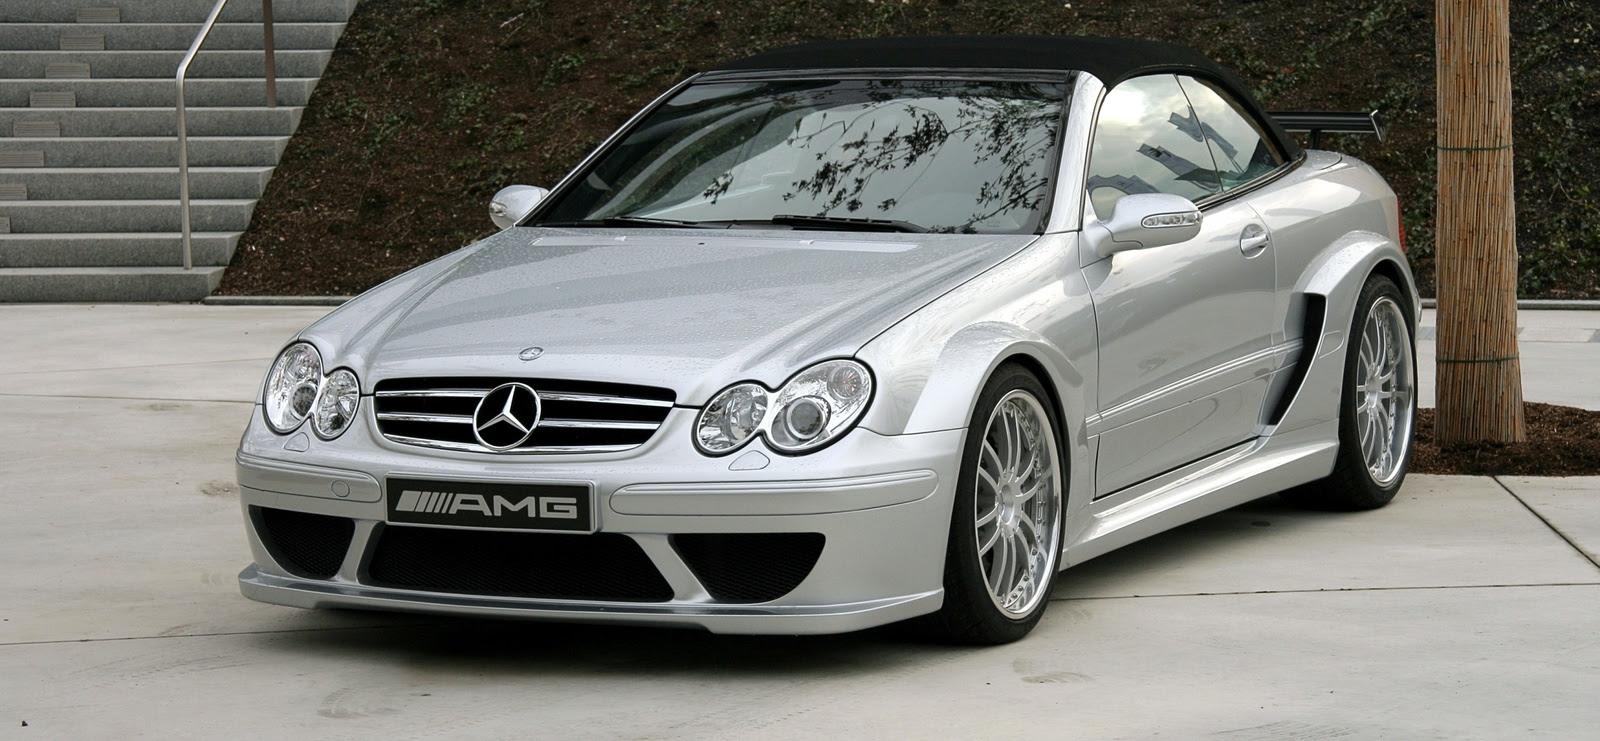 2002 Mercedes-Benz CLK-Class - Trim Information - CarGurus